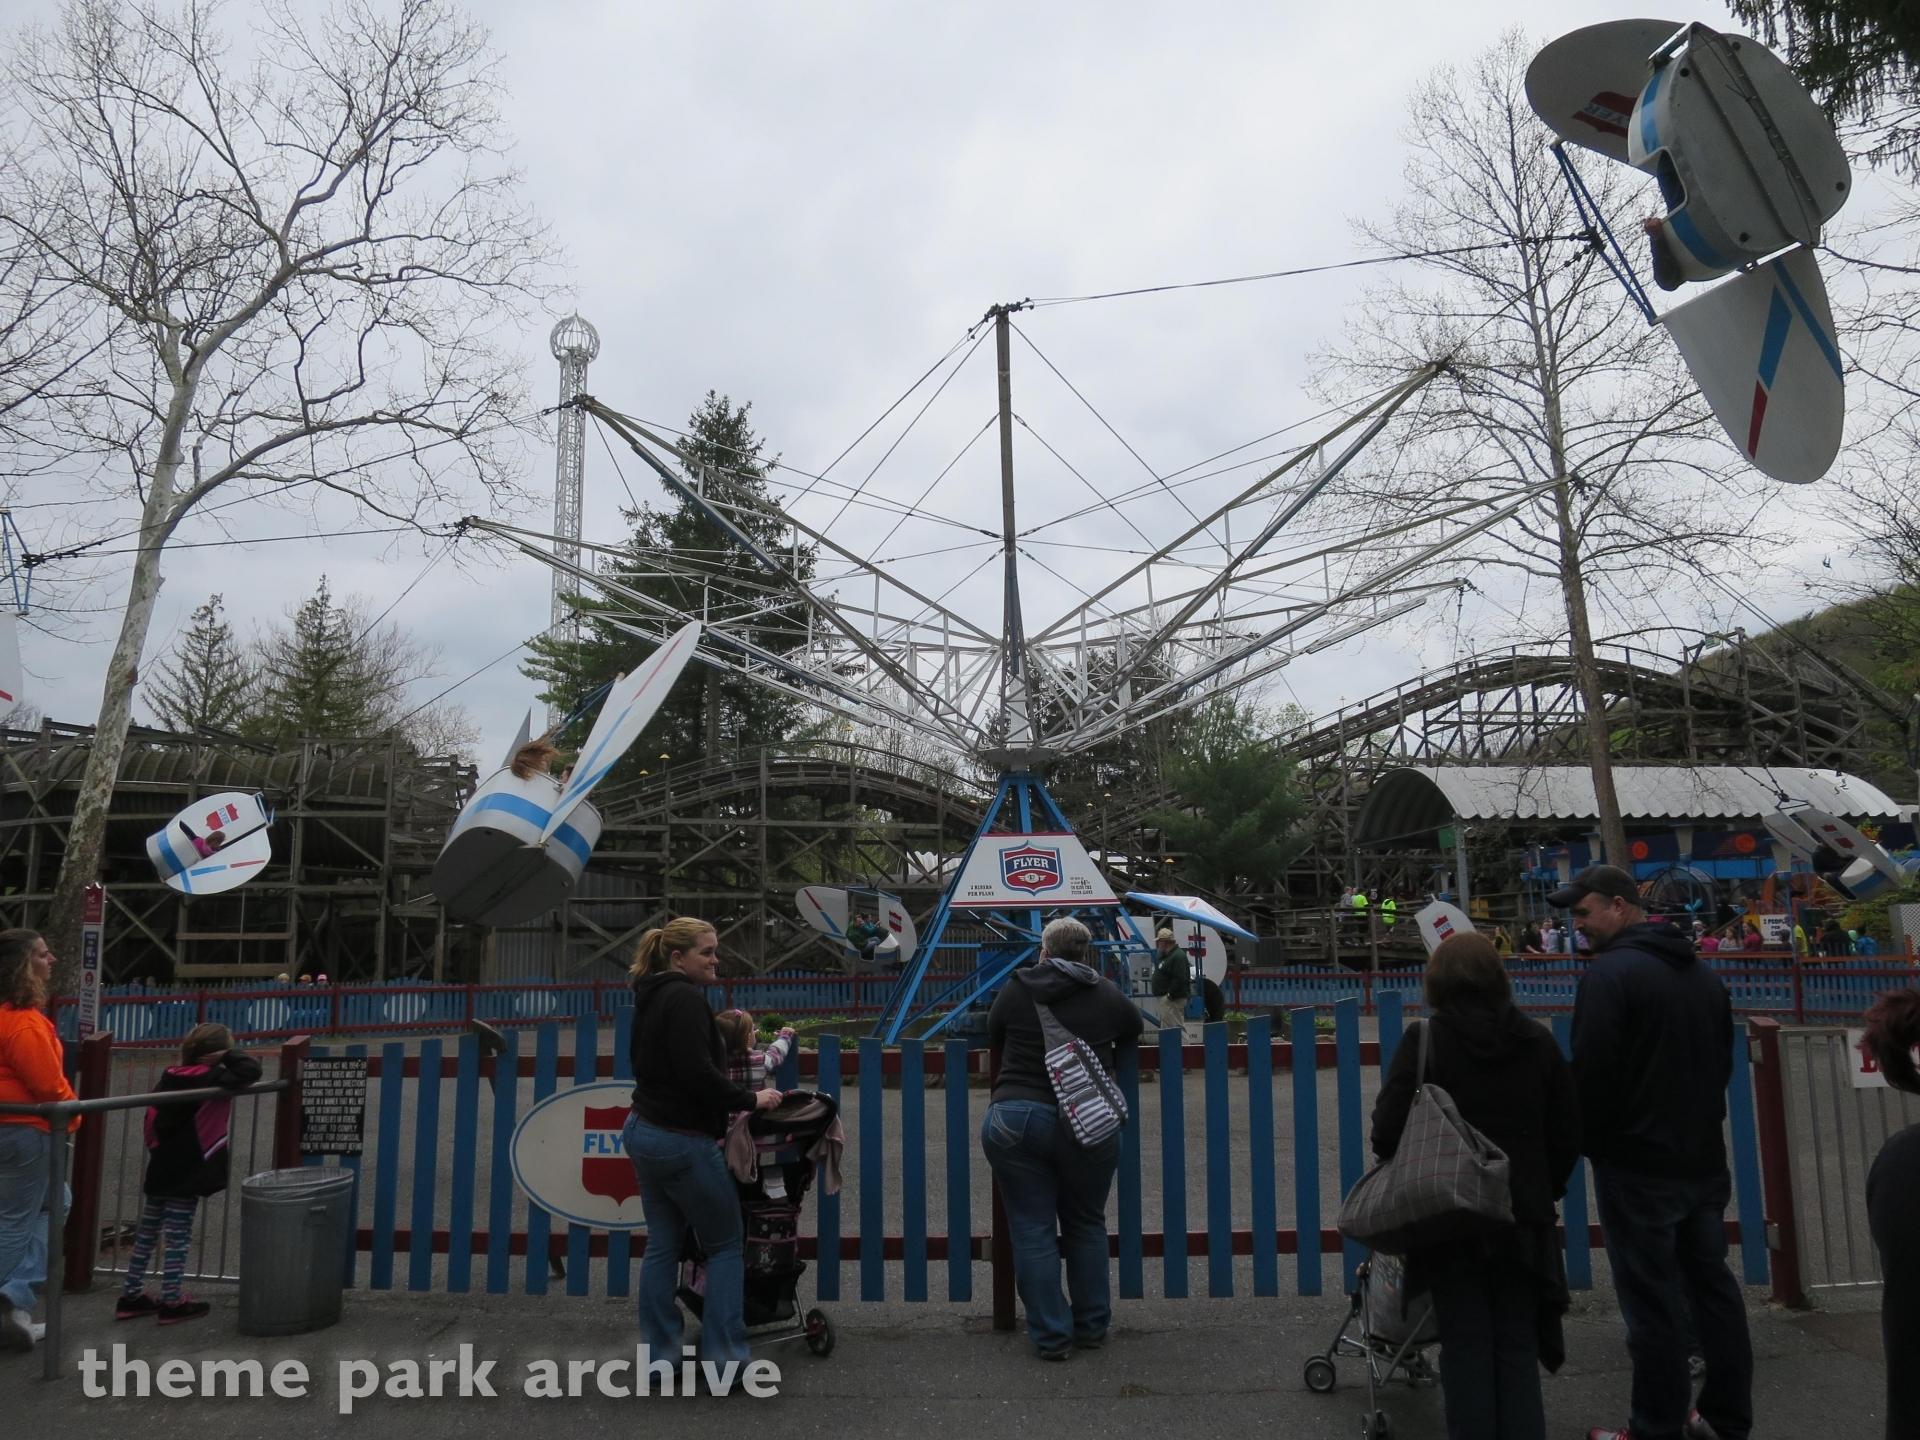 Flyer at Knoebels Amusement Resort